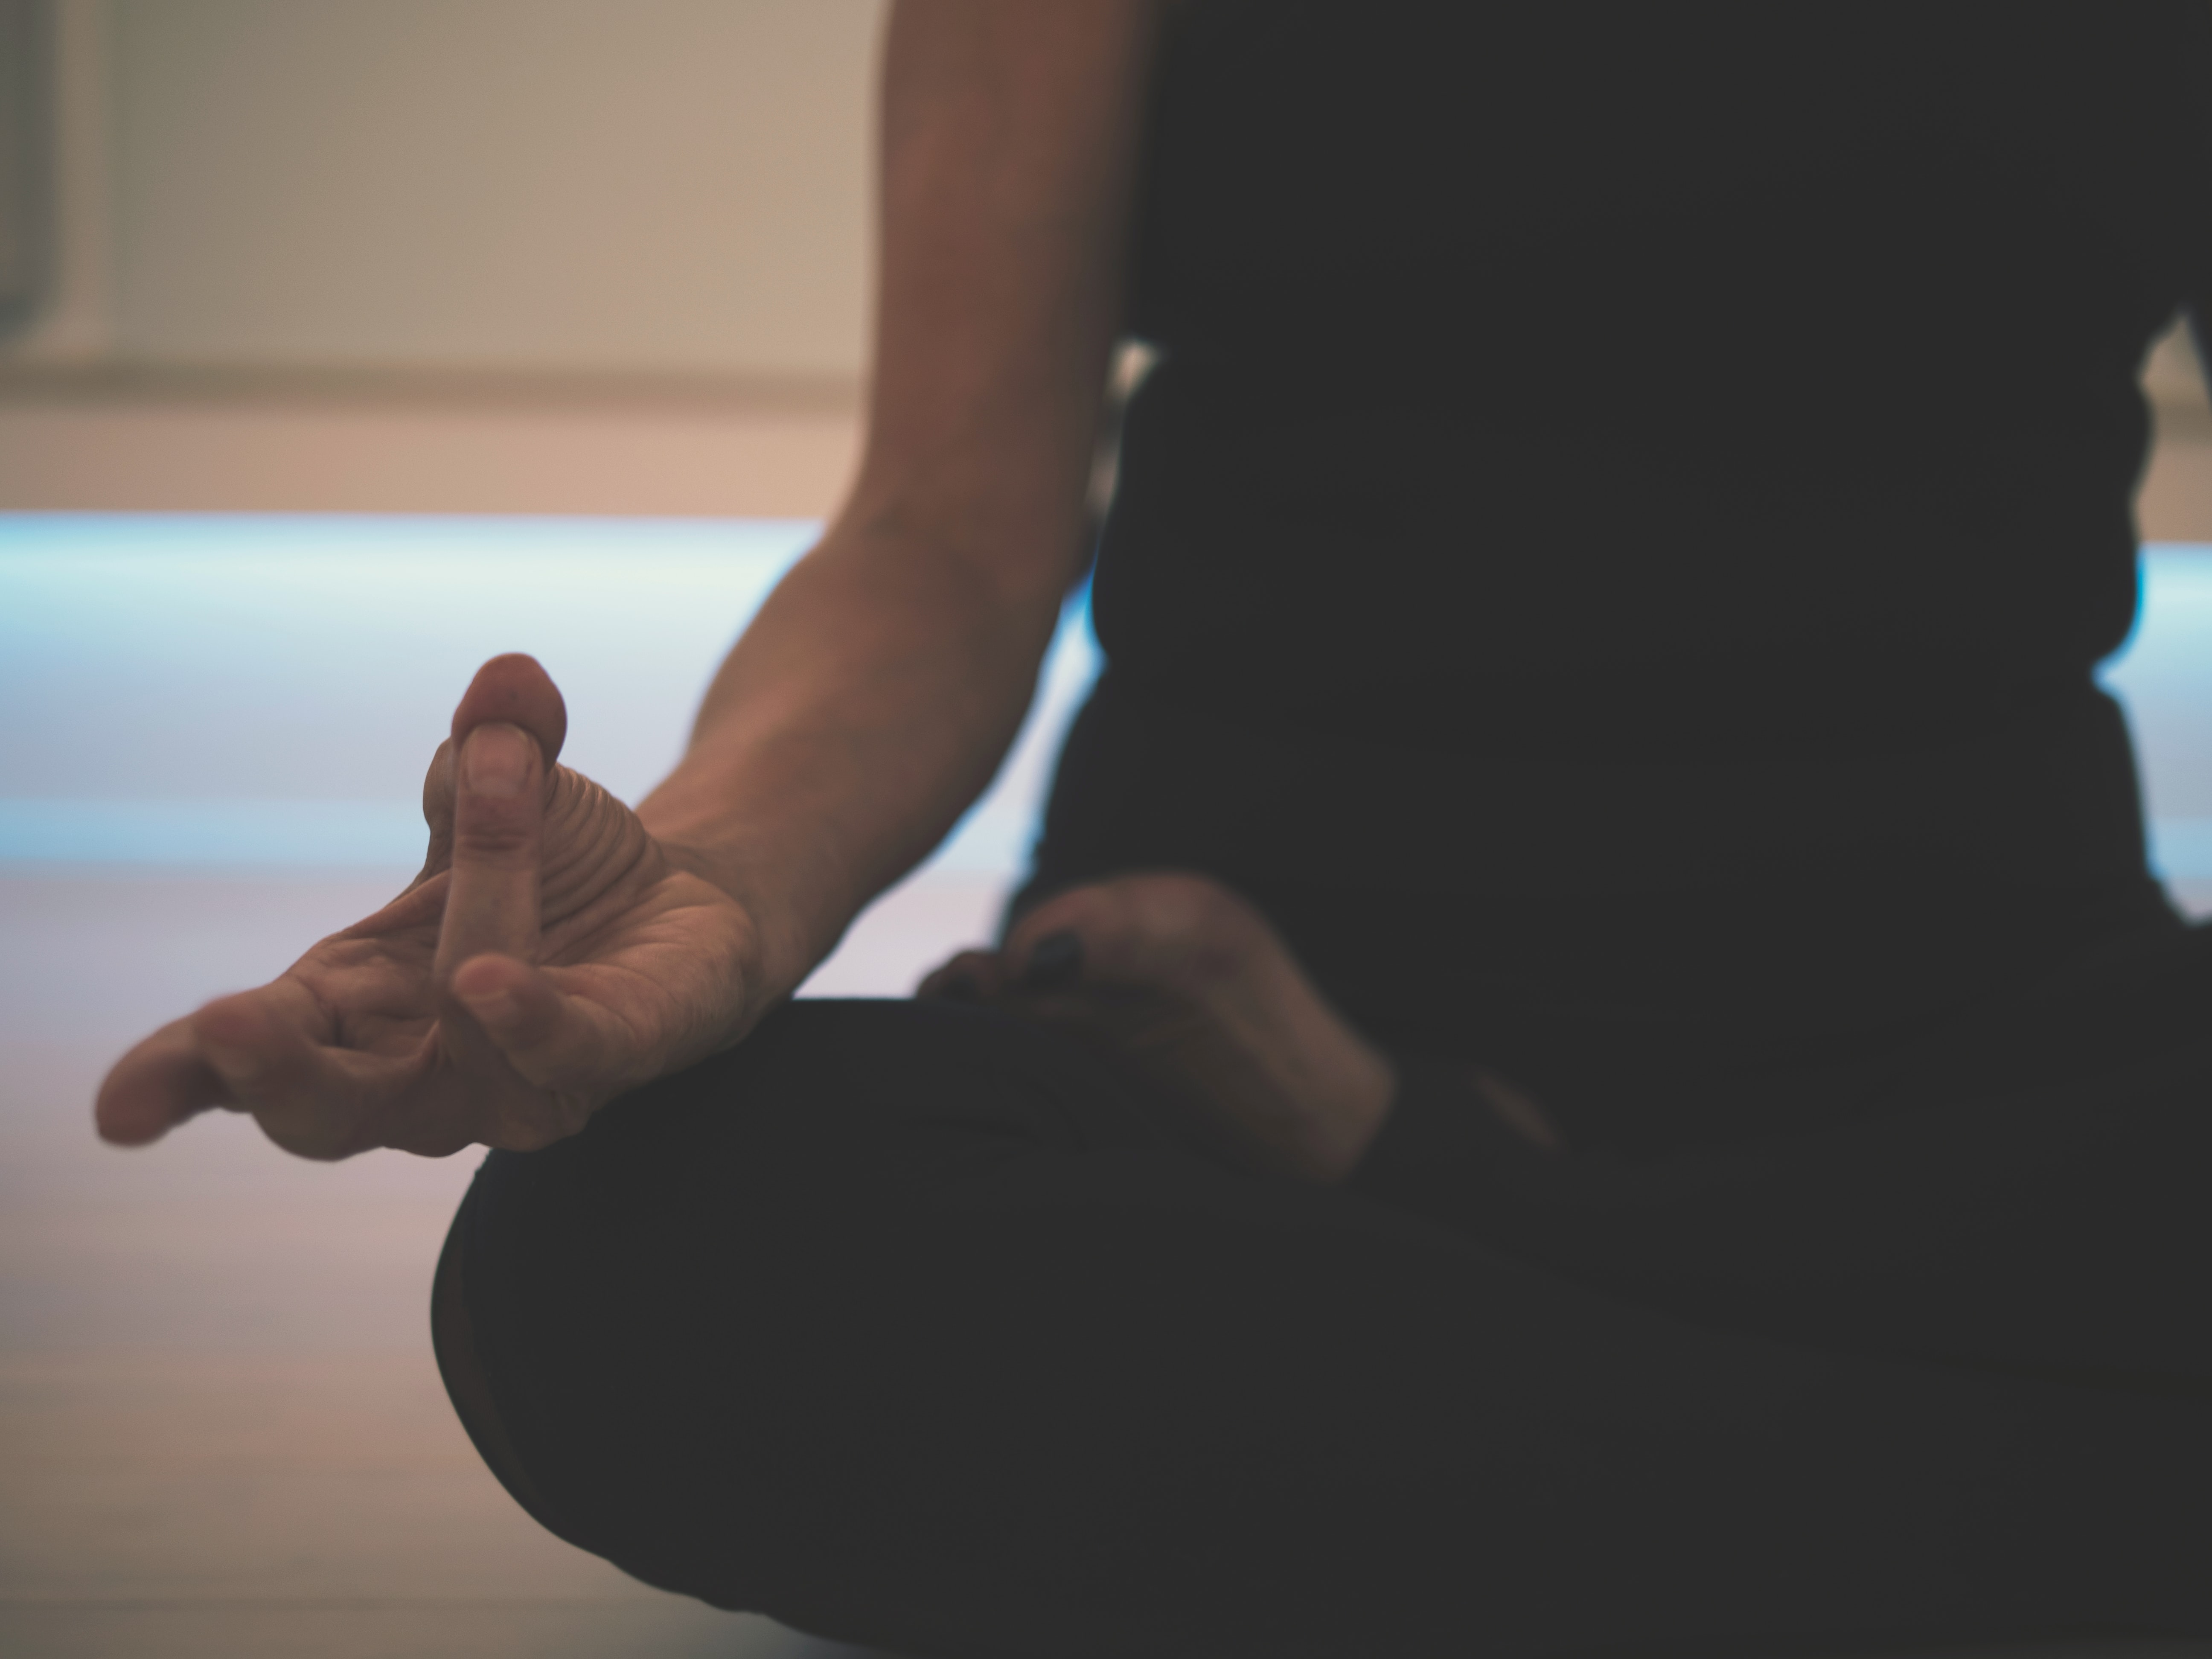 new year resolution mindfulness meditation yoga localbini biniblog lifestyle tips